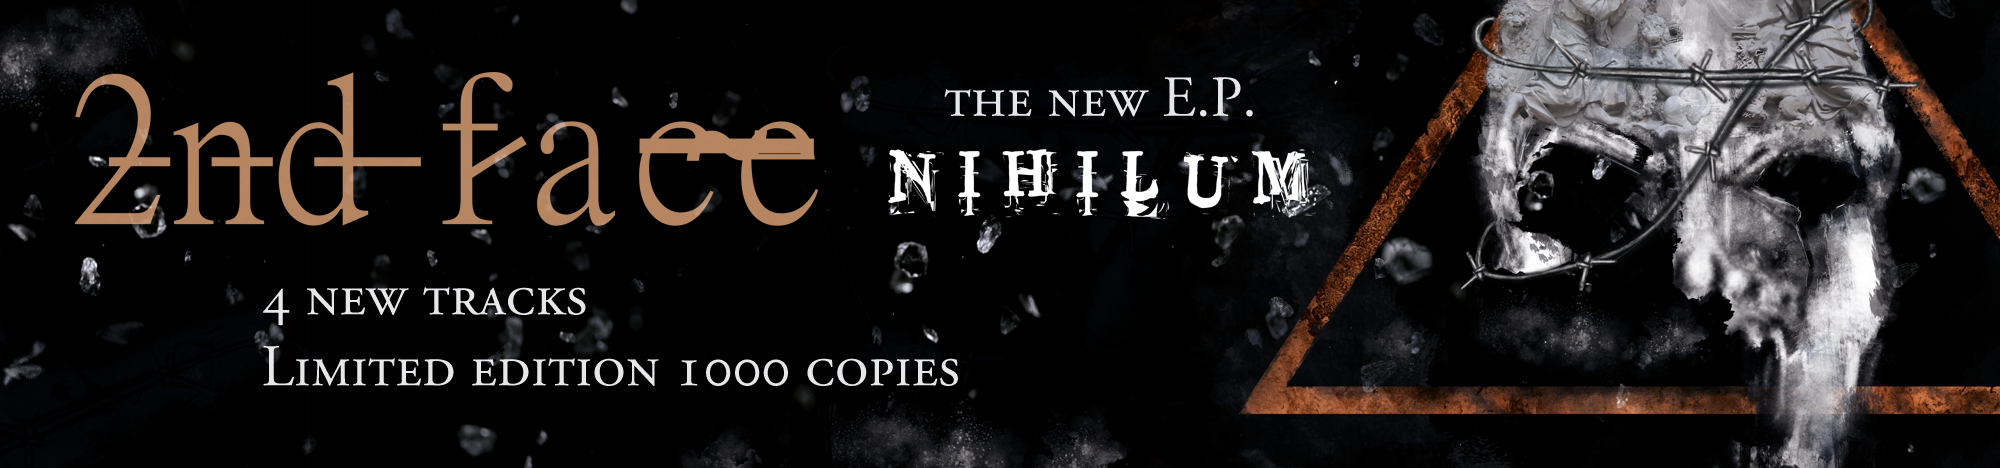 nihilum single 2nd face